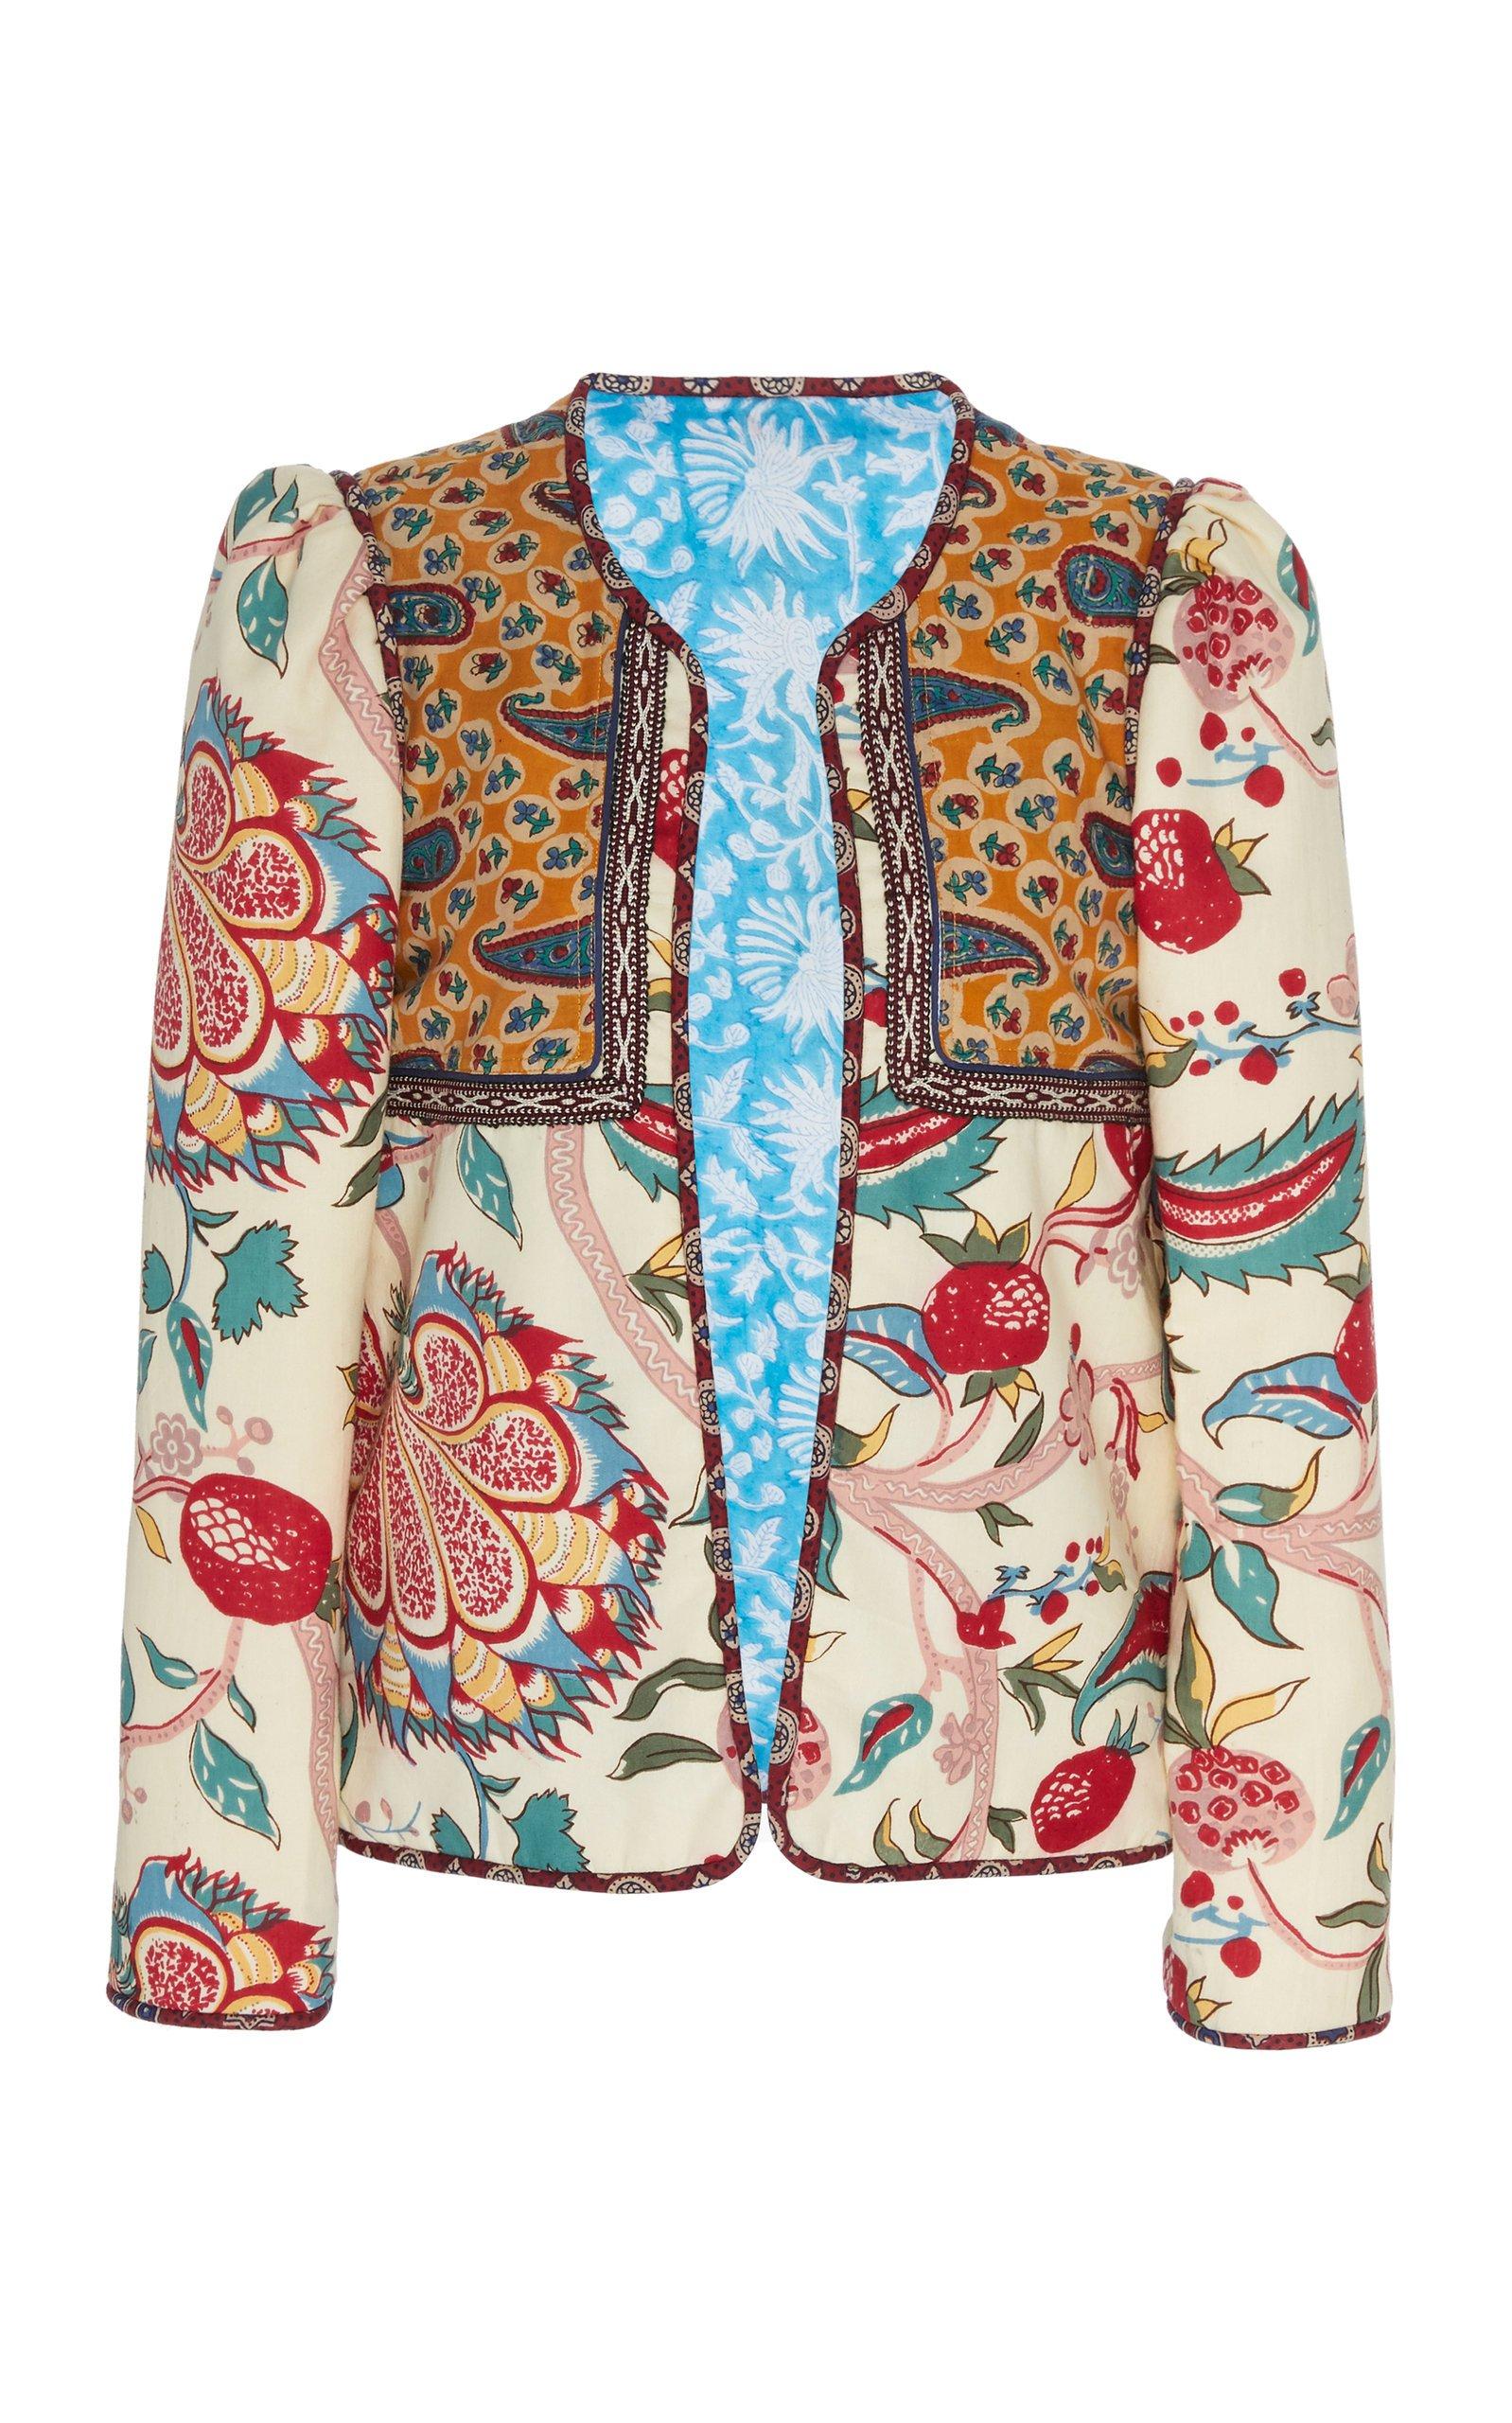 Alix of Bohemia Pomegranate Cotton Jacket Size: XL